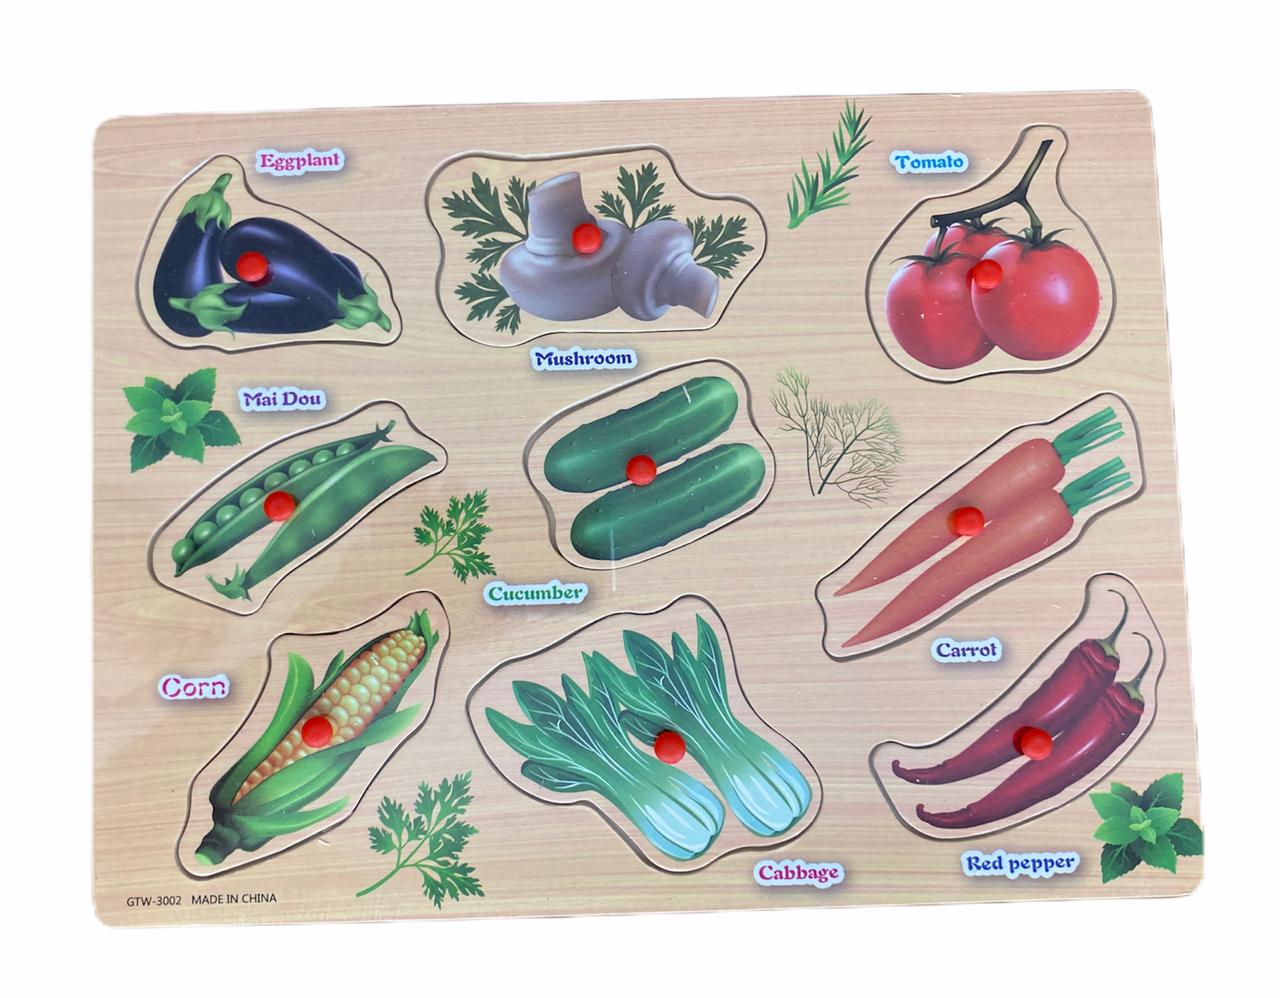 Tabuleiro Educativo Legumes